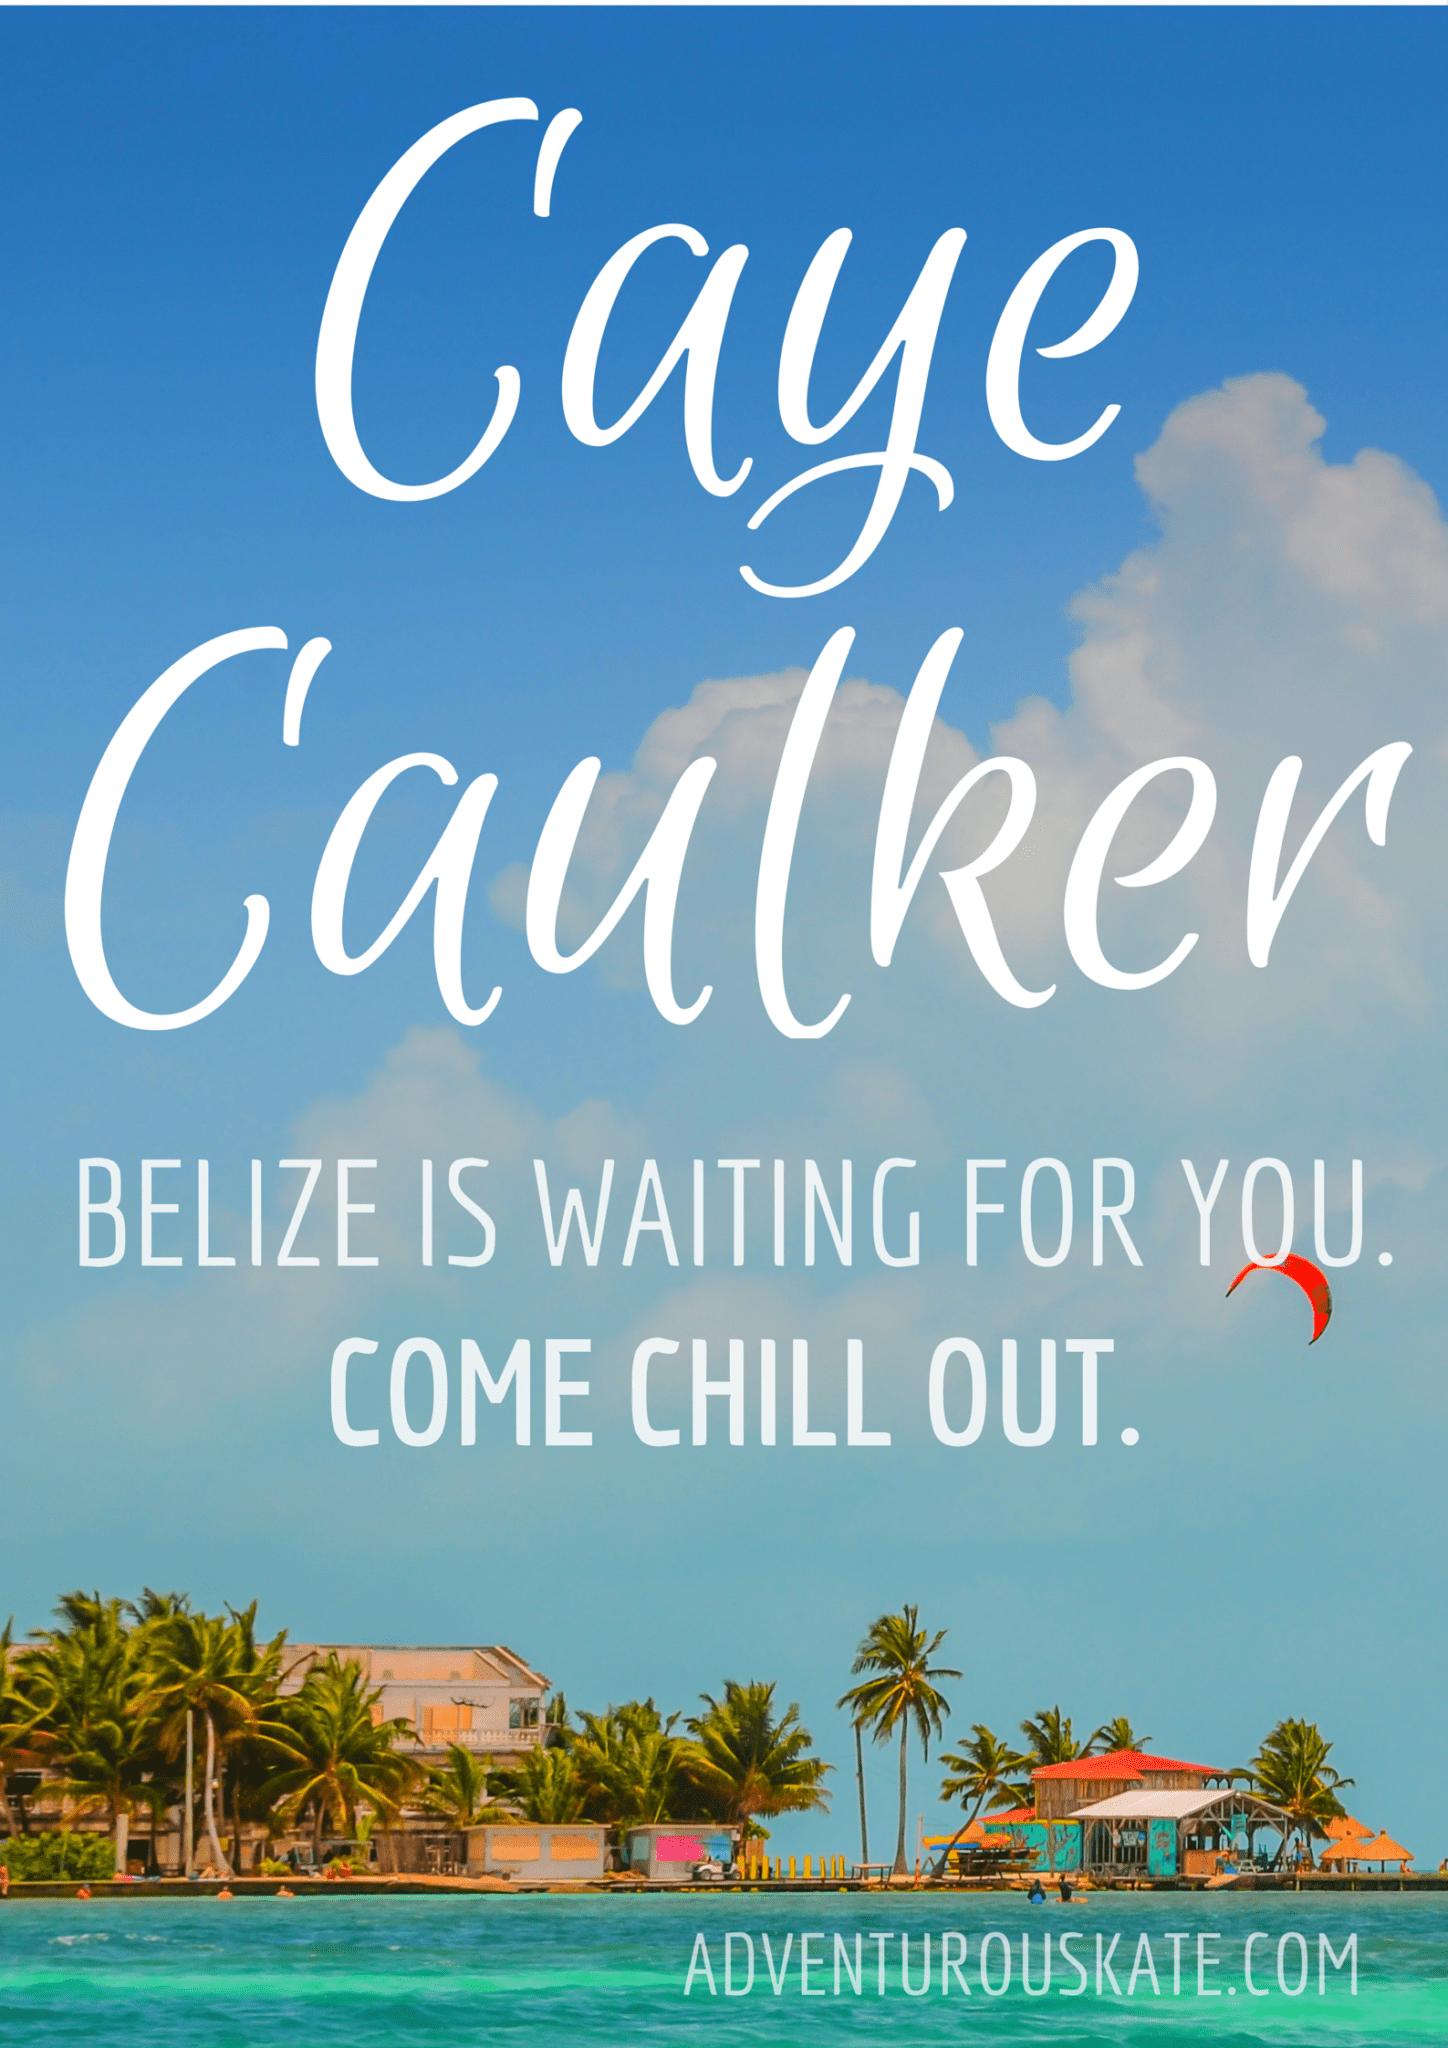 Caye Caulker, Belize, is waiting for you! via Adventurous Kate